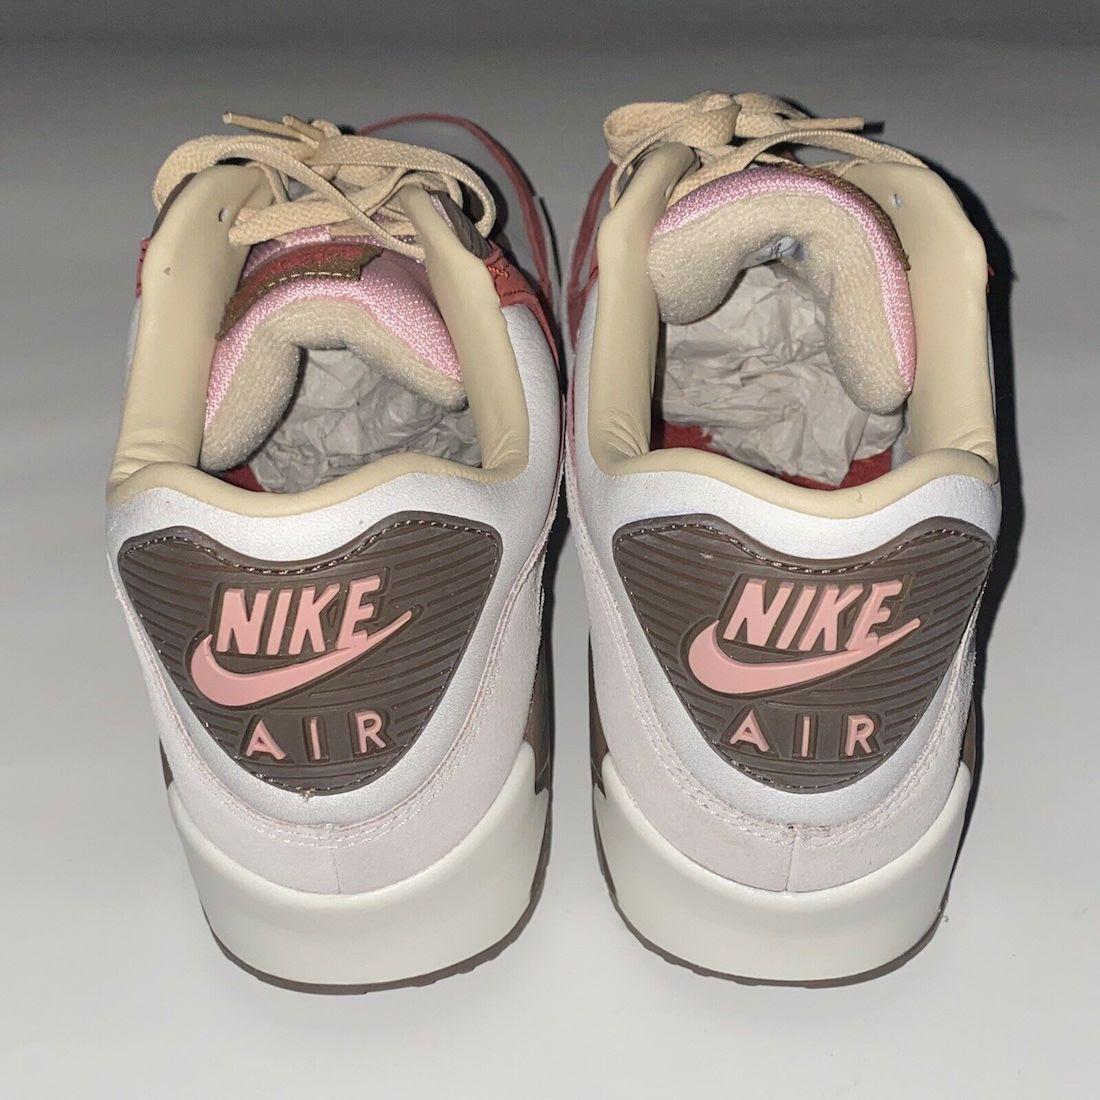 Nike Air Max 90 Bacon 2021 CU1816-100 Release Date